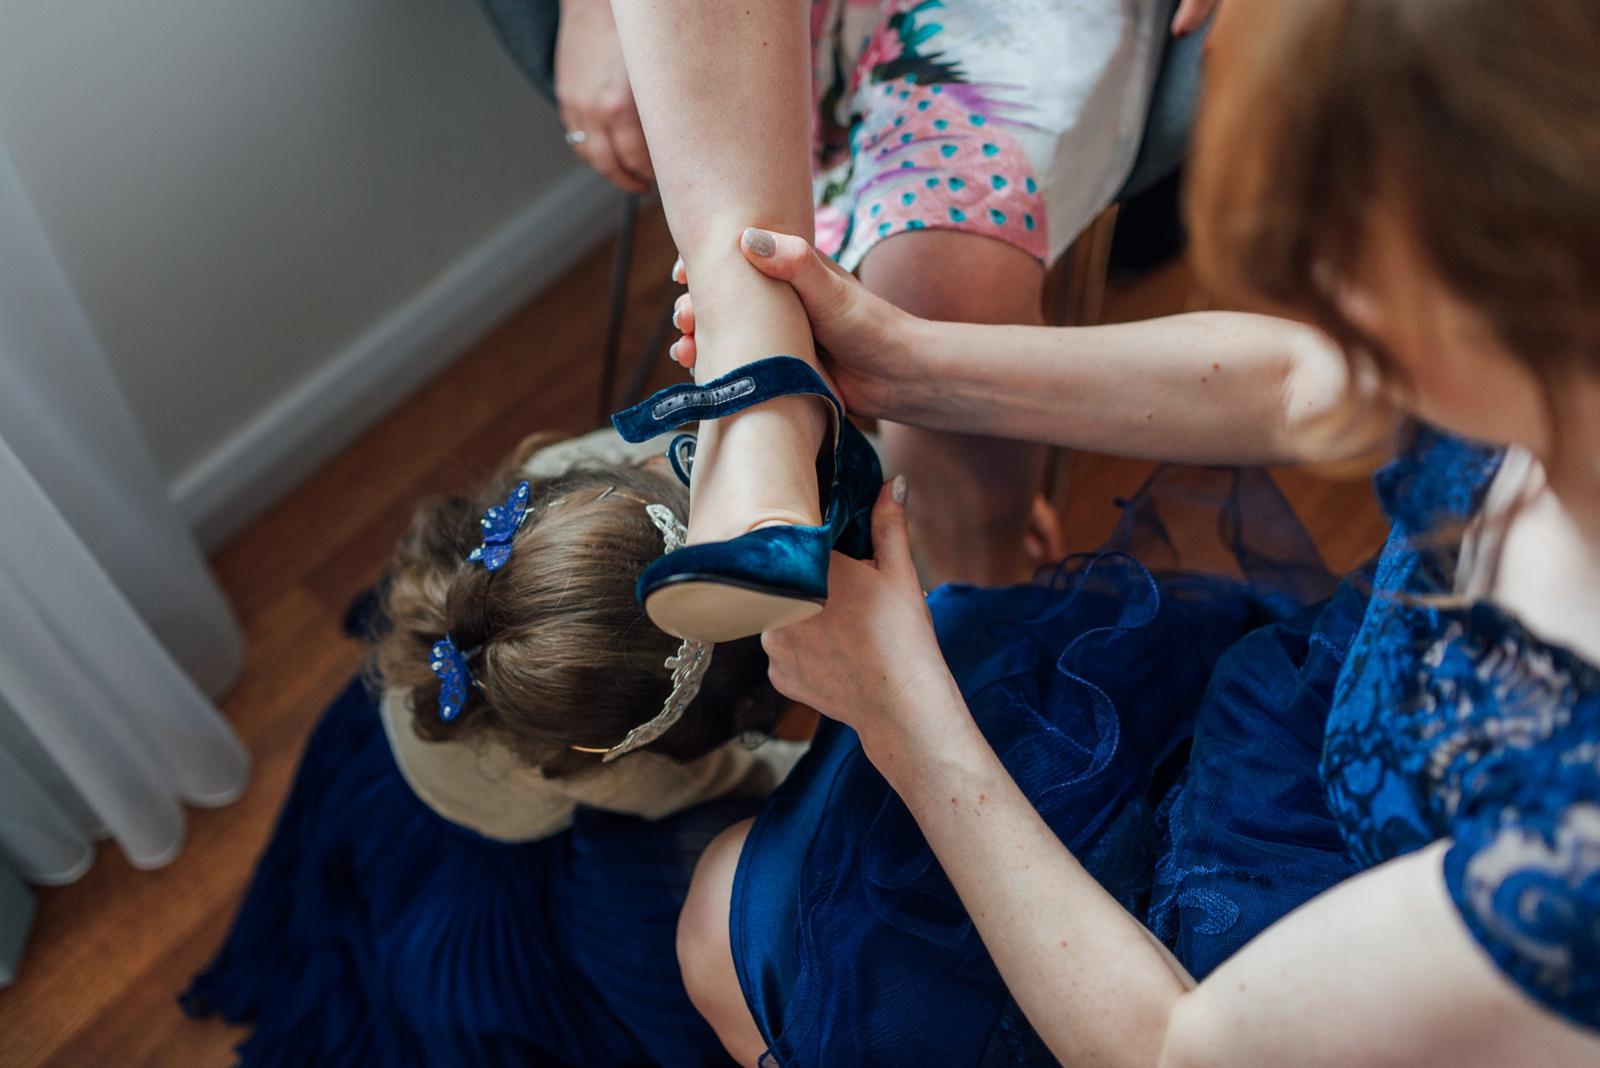 thecaves_retro_DIY_wedding_00017.jpg